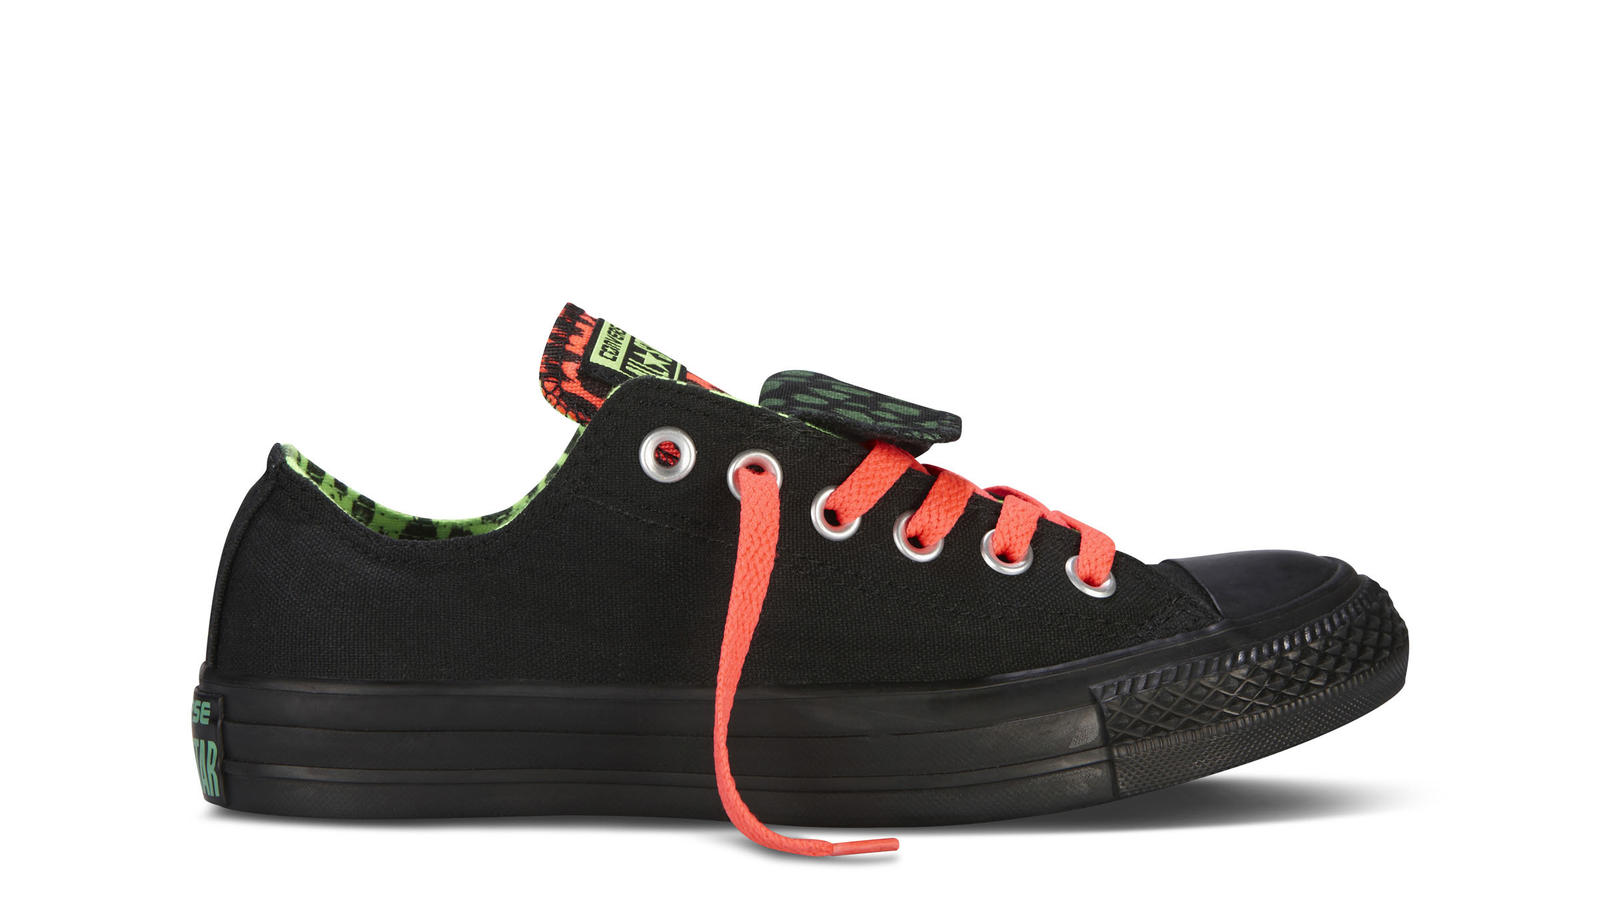 Converse Fall 2013 All Star Footwear Collections Celebrate ... 3963b481ecc1